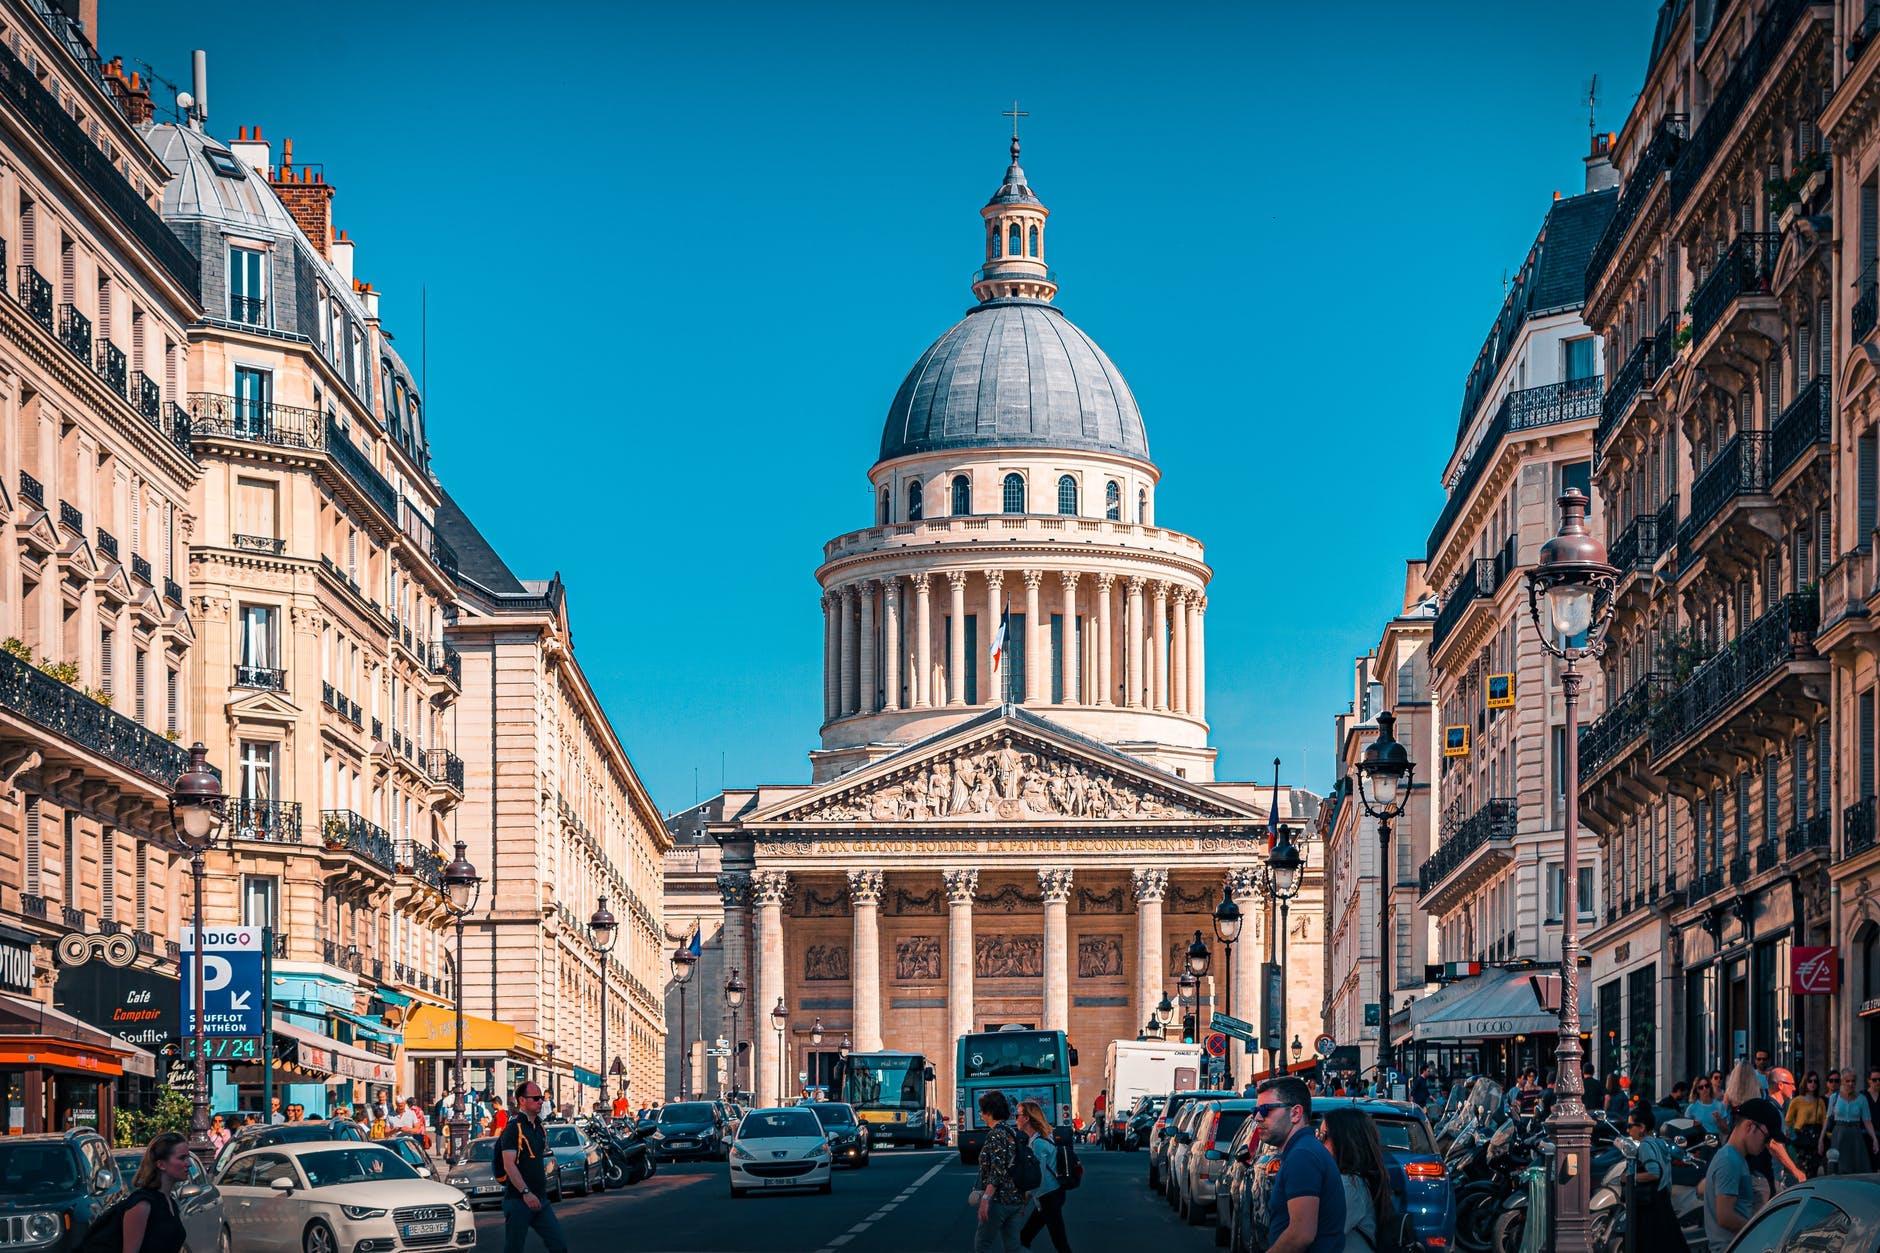 Онлайн-экскурсия «Колорит улиц Парижа: от Сорбонны до Люксембургского сада»